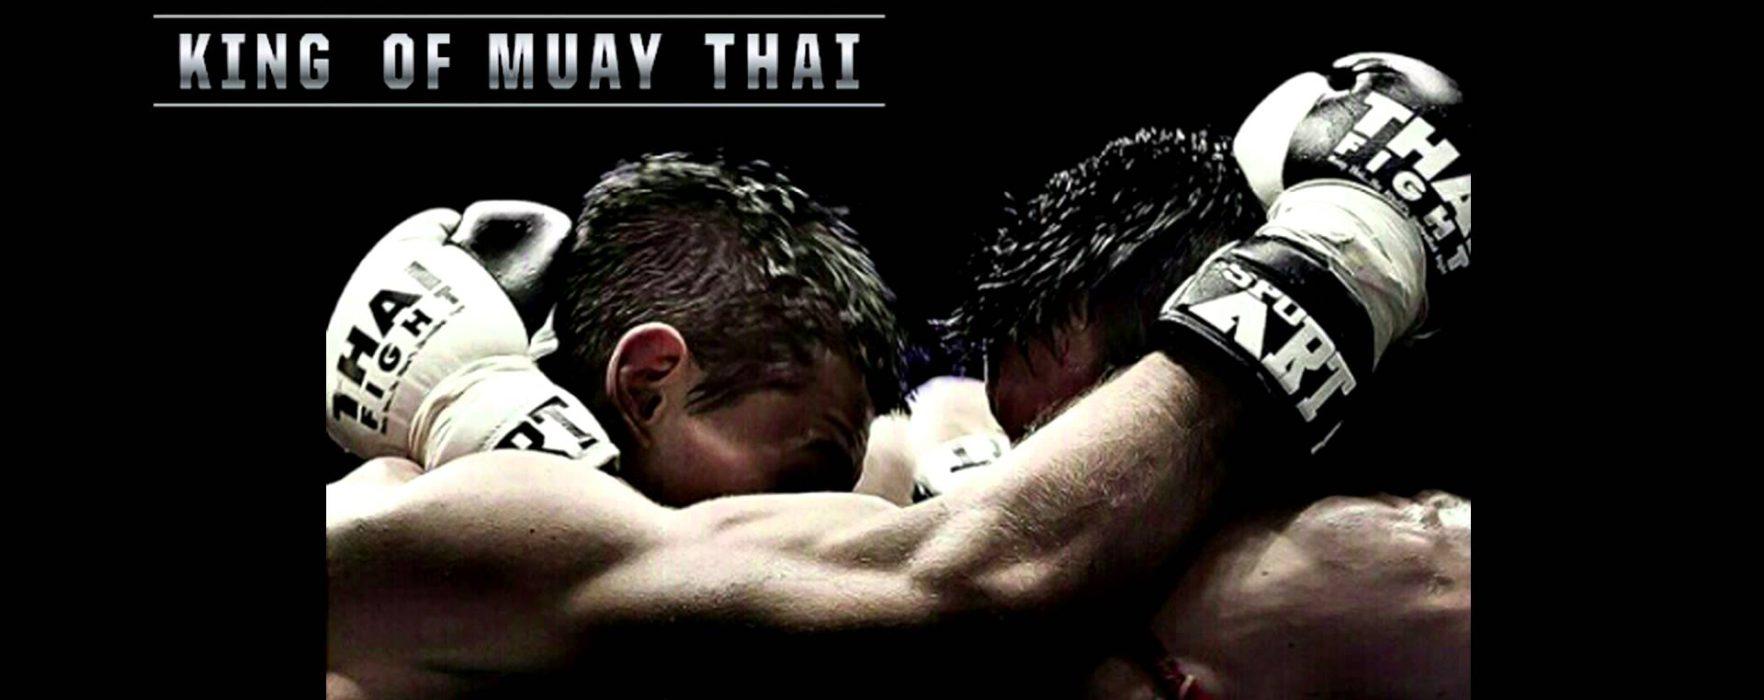 Thai Boxe Mania in corso e Mr. Babuto fa un annuncio stratosferico!!!